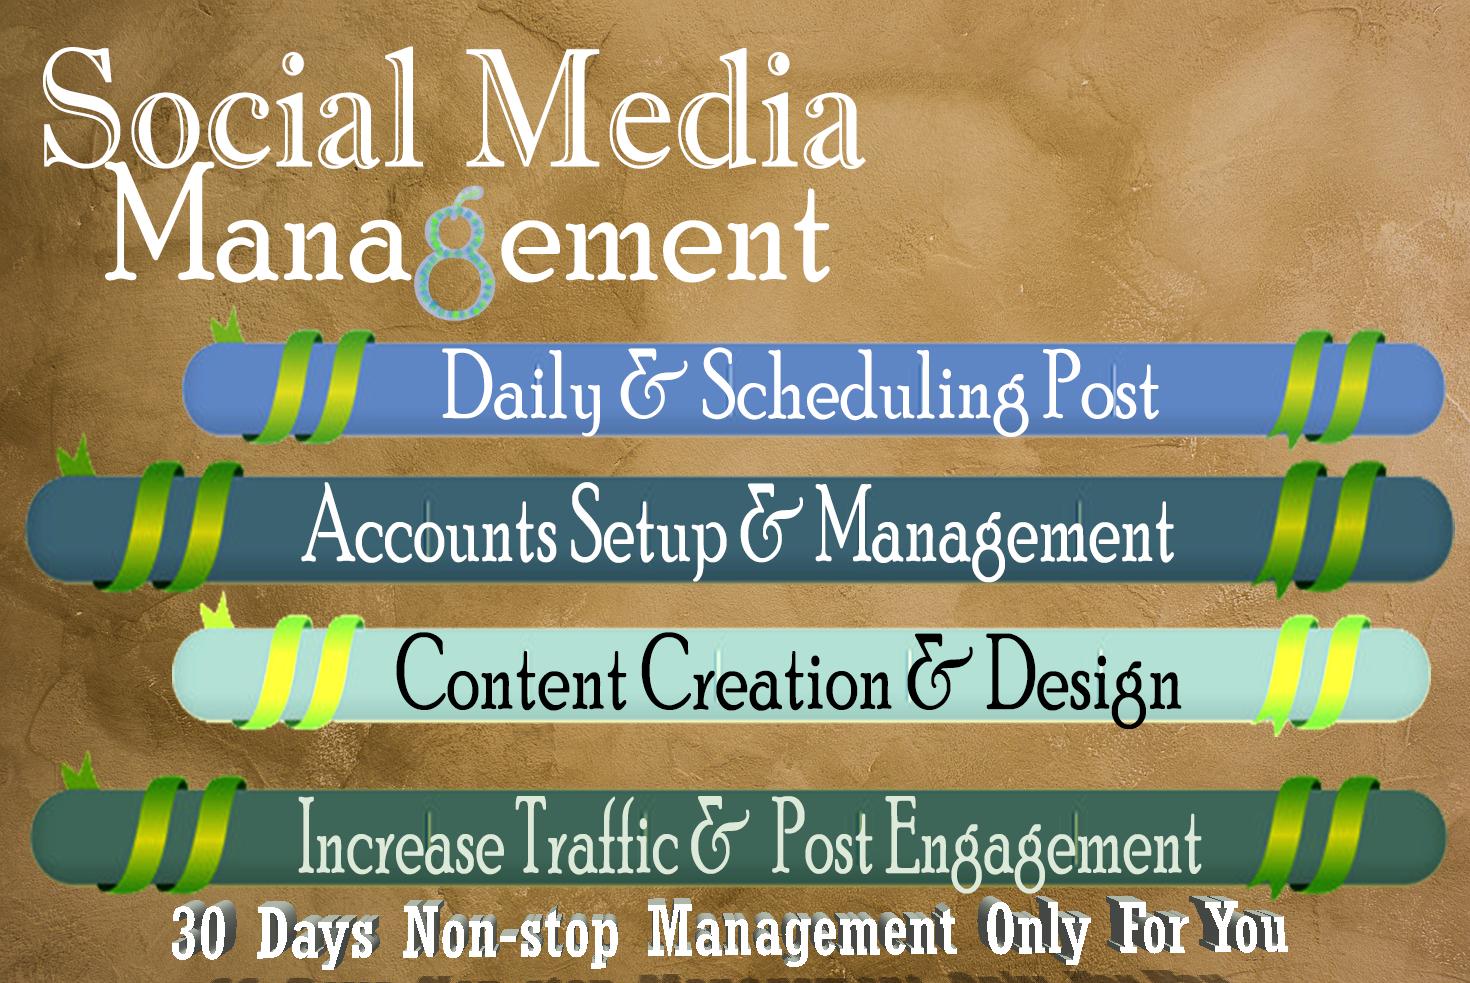 Do Social Media Management For 30 Days